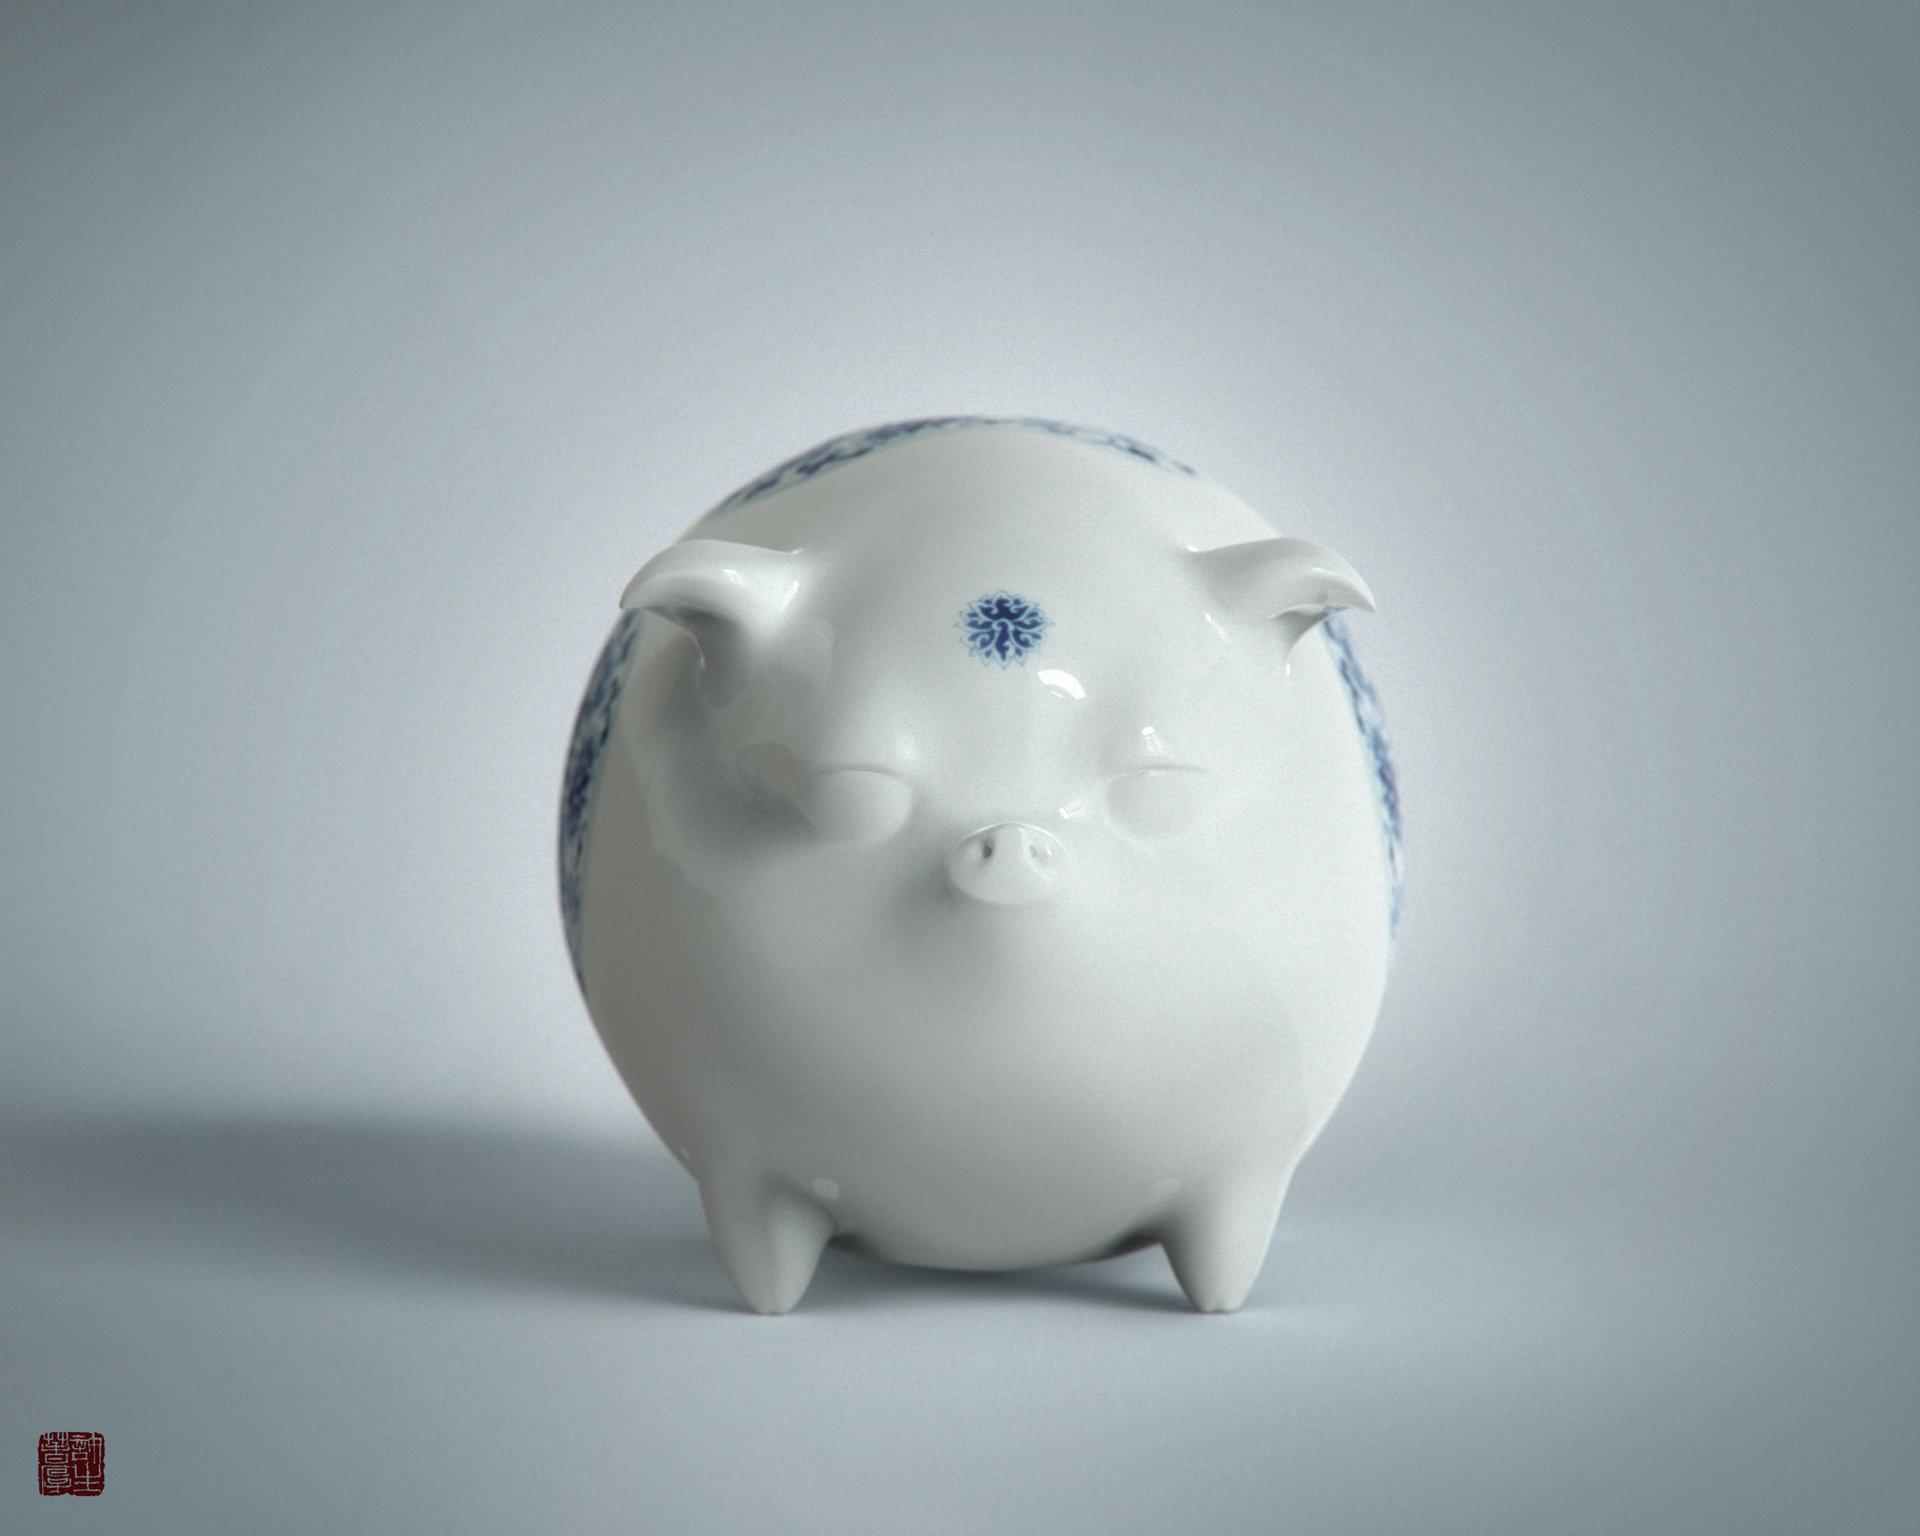 Pig exposure.50